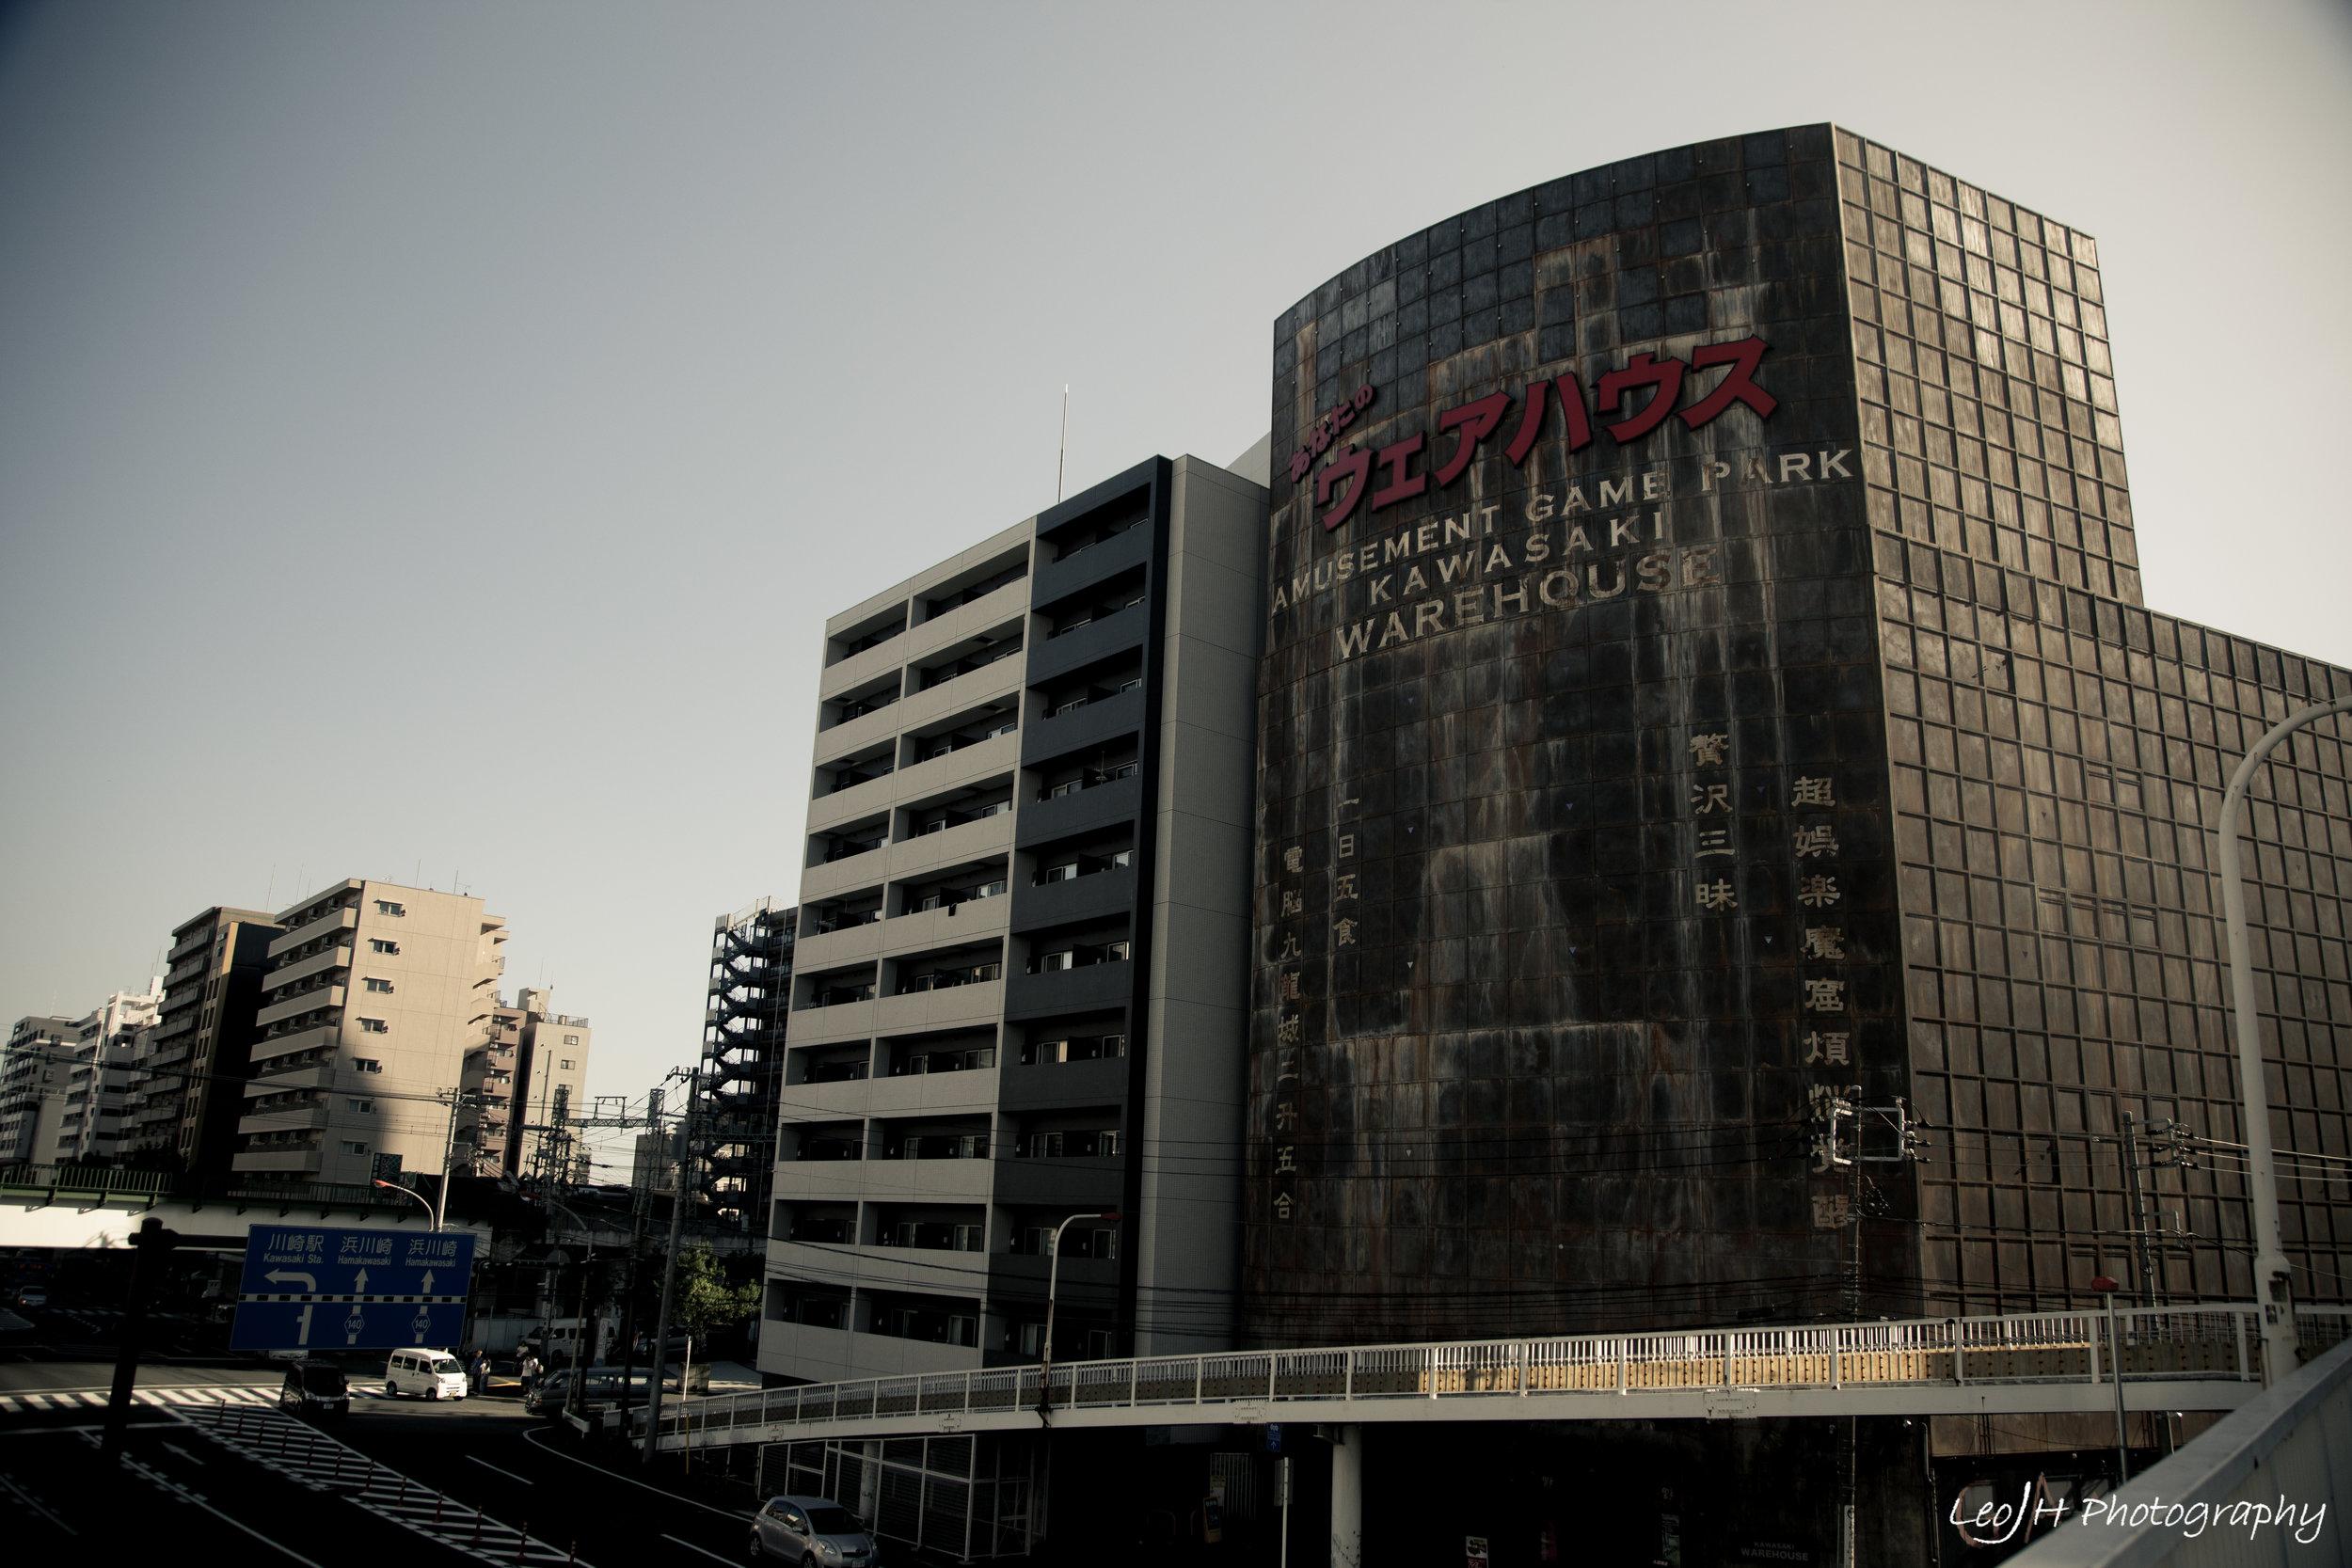 The exterior of Kawasaki Warehouse